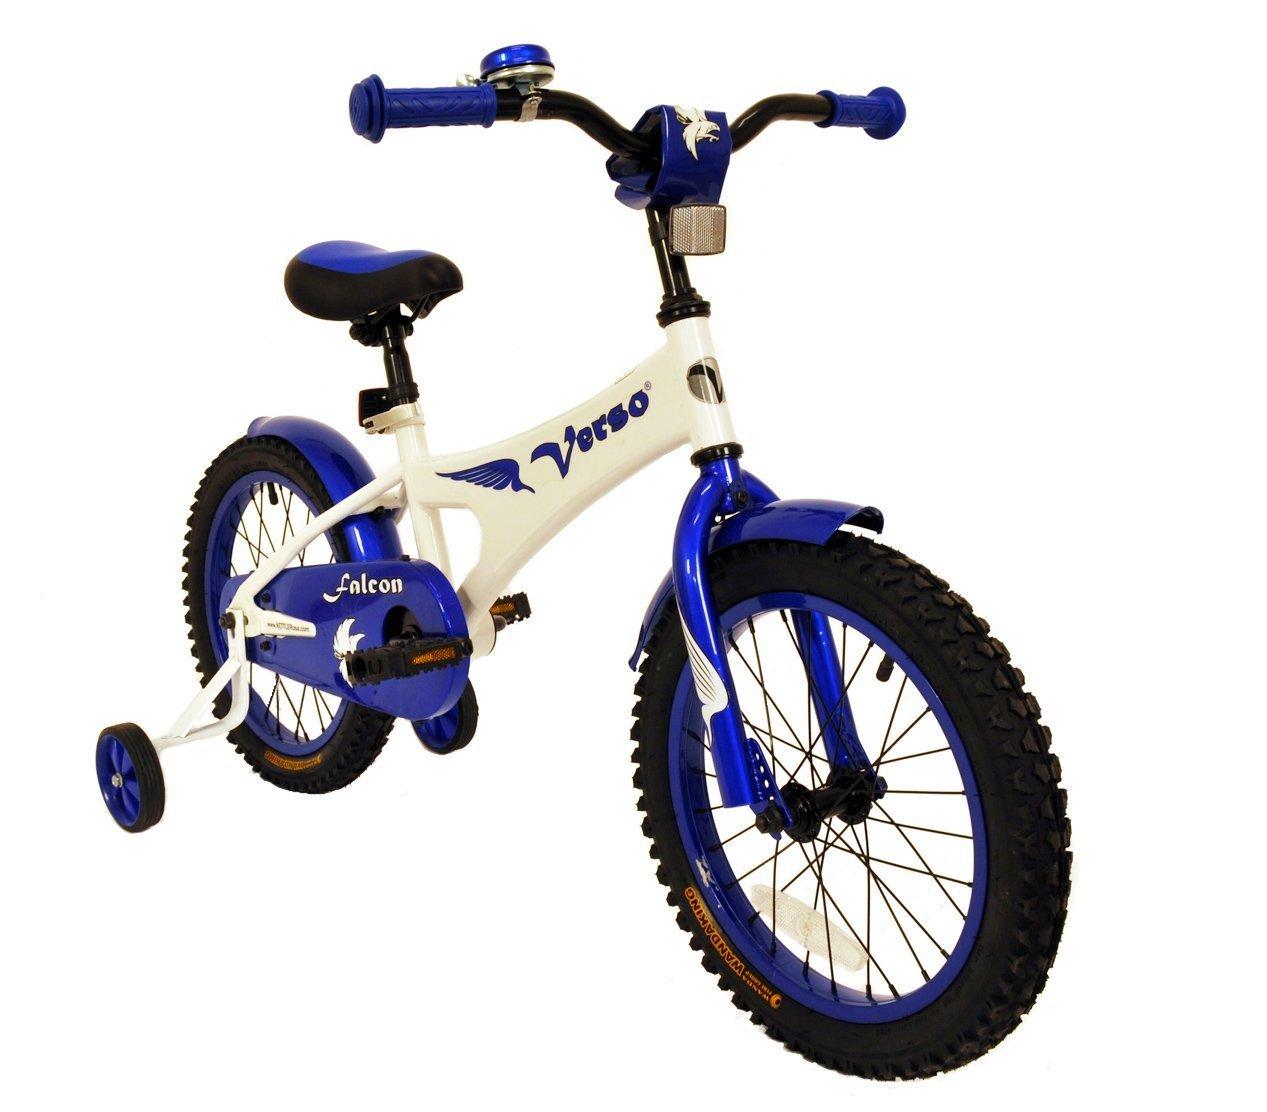 Kettler 男児用自転車 VERSO FALCON B01M320AR7ブルー 16インチ